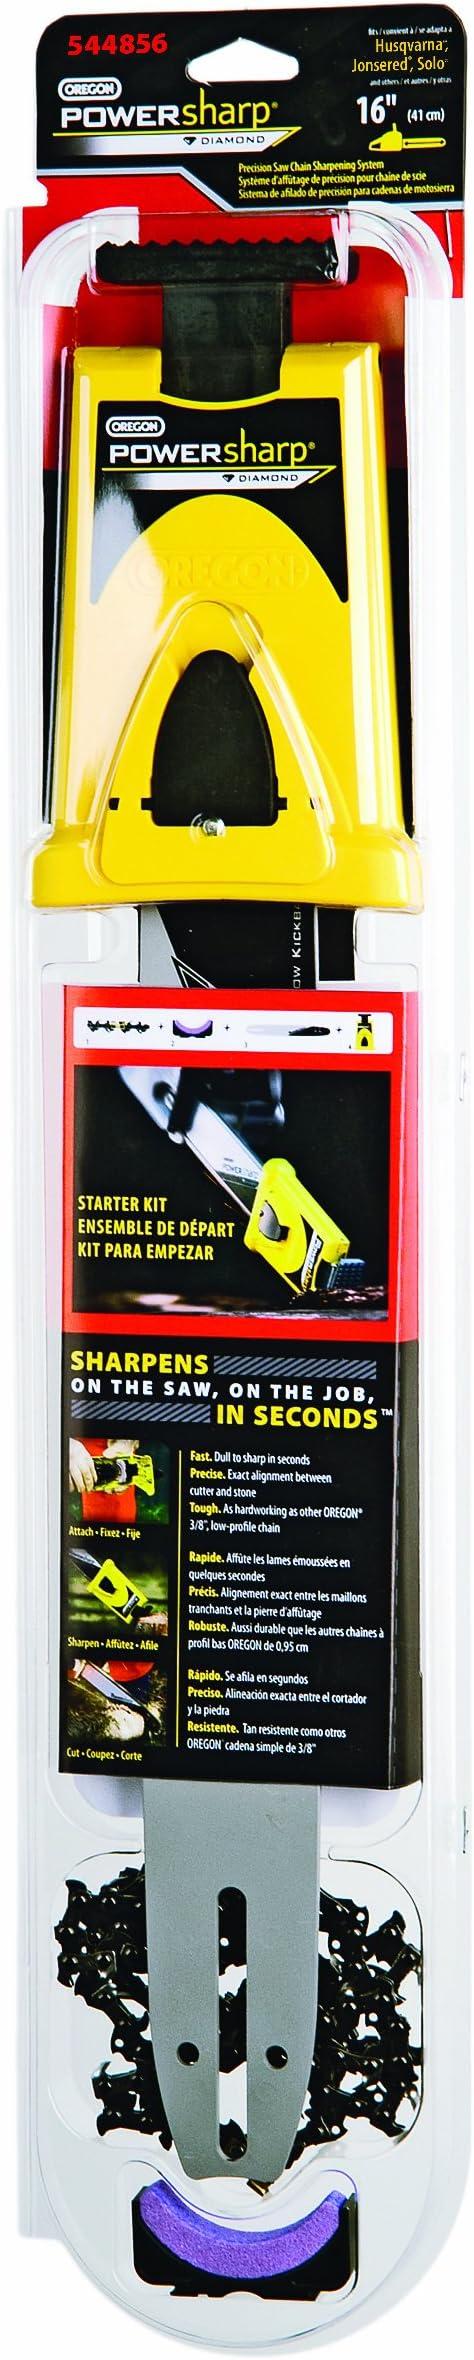 Amazon Com Oregon 544856 16 Inch Powersharp Starter Kit For Husqvarna Garden Outdoor